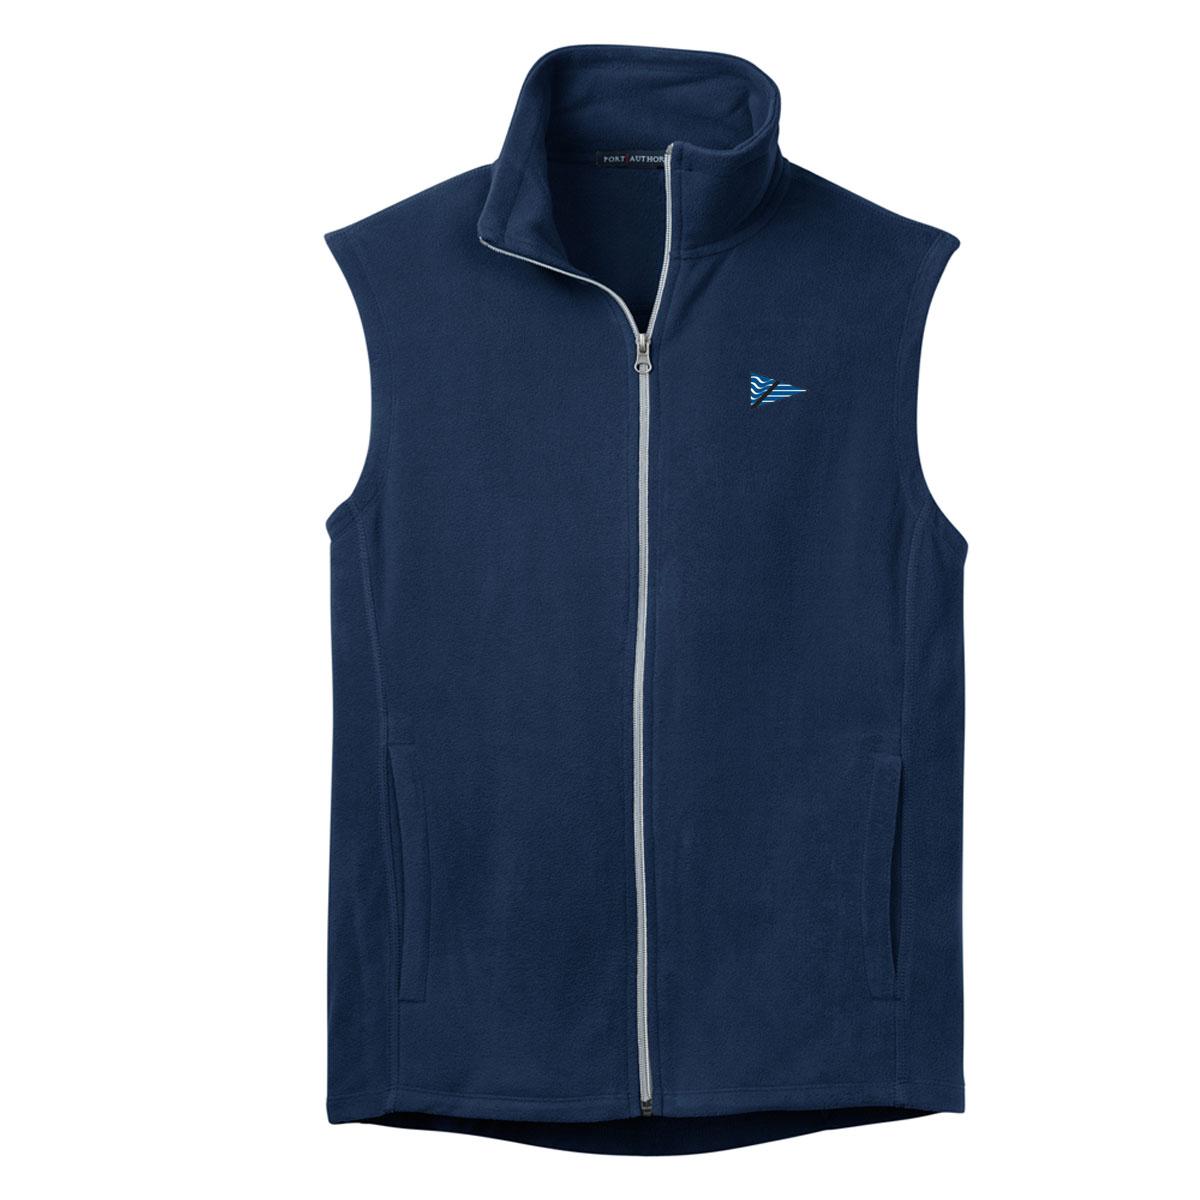 Breakwater Yacht- M's Fleece Vest